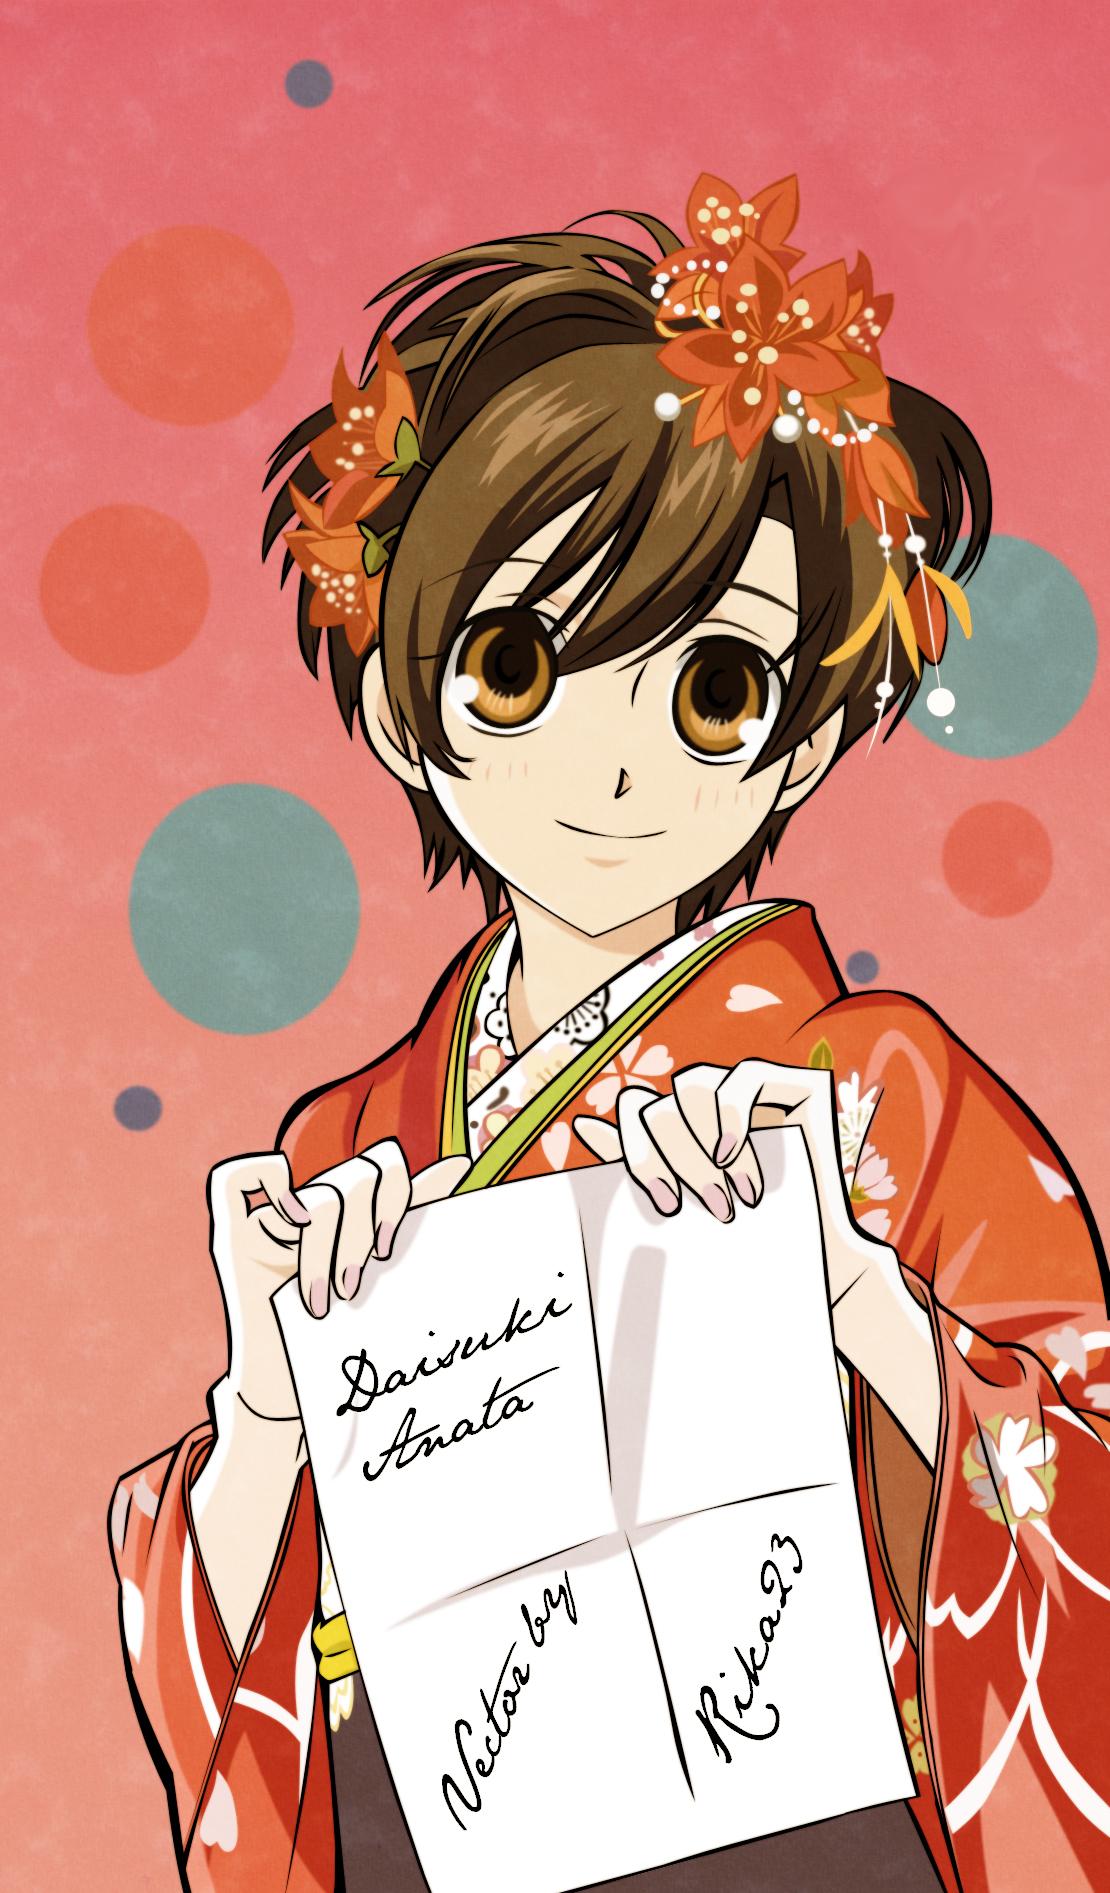 Fujioka Haruhi Ouran High School Host Club Zerochan Anime